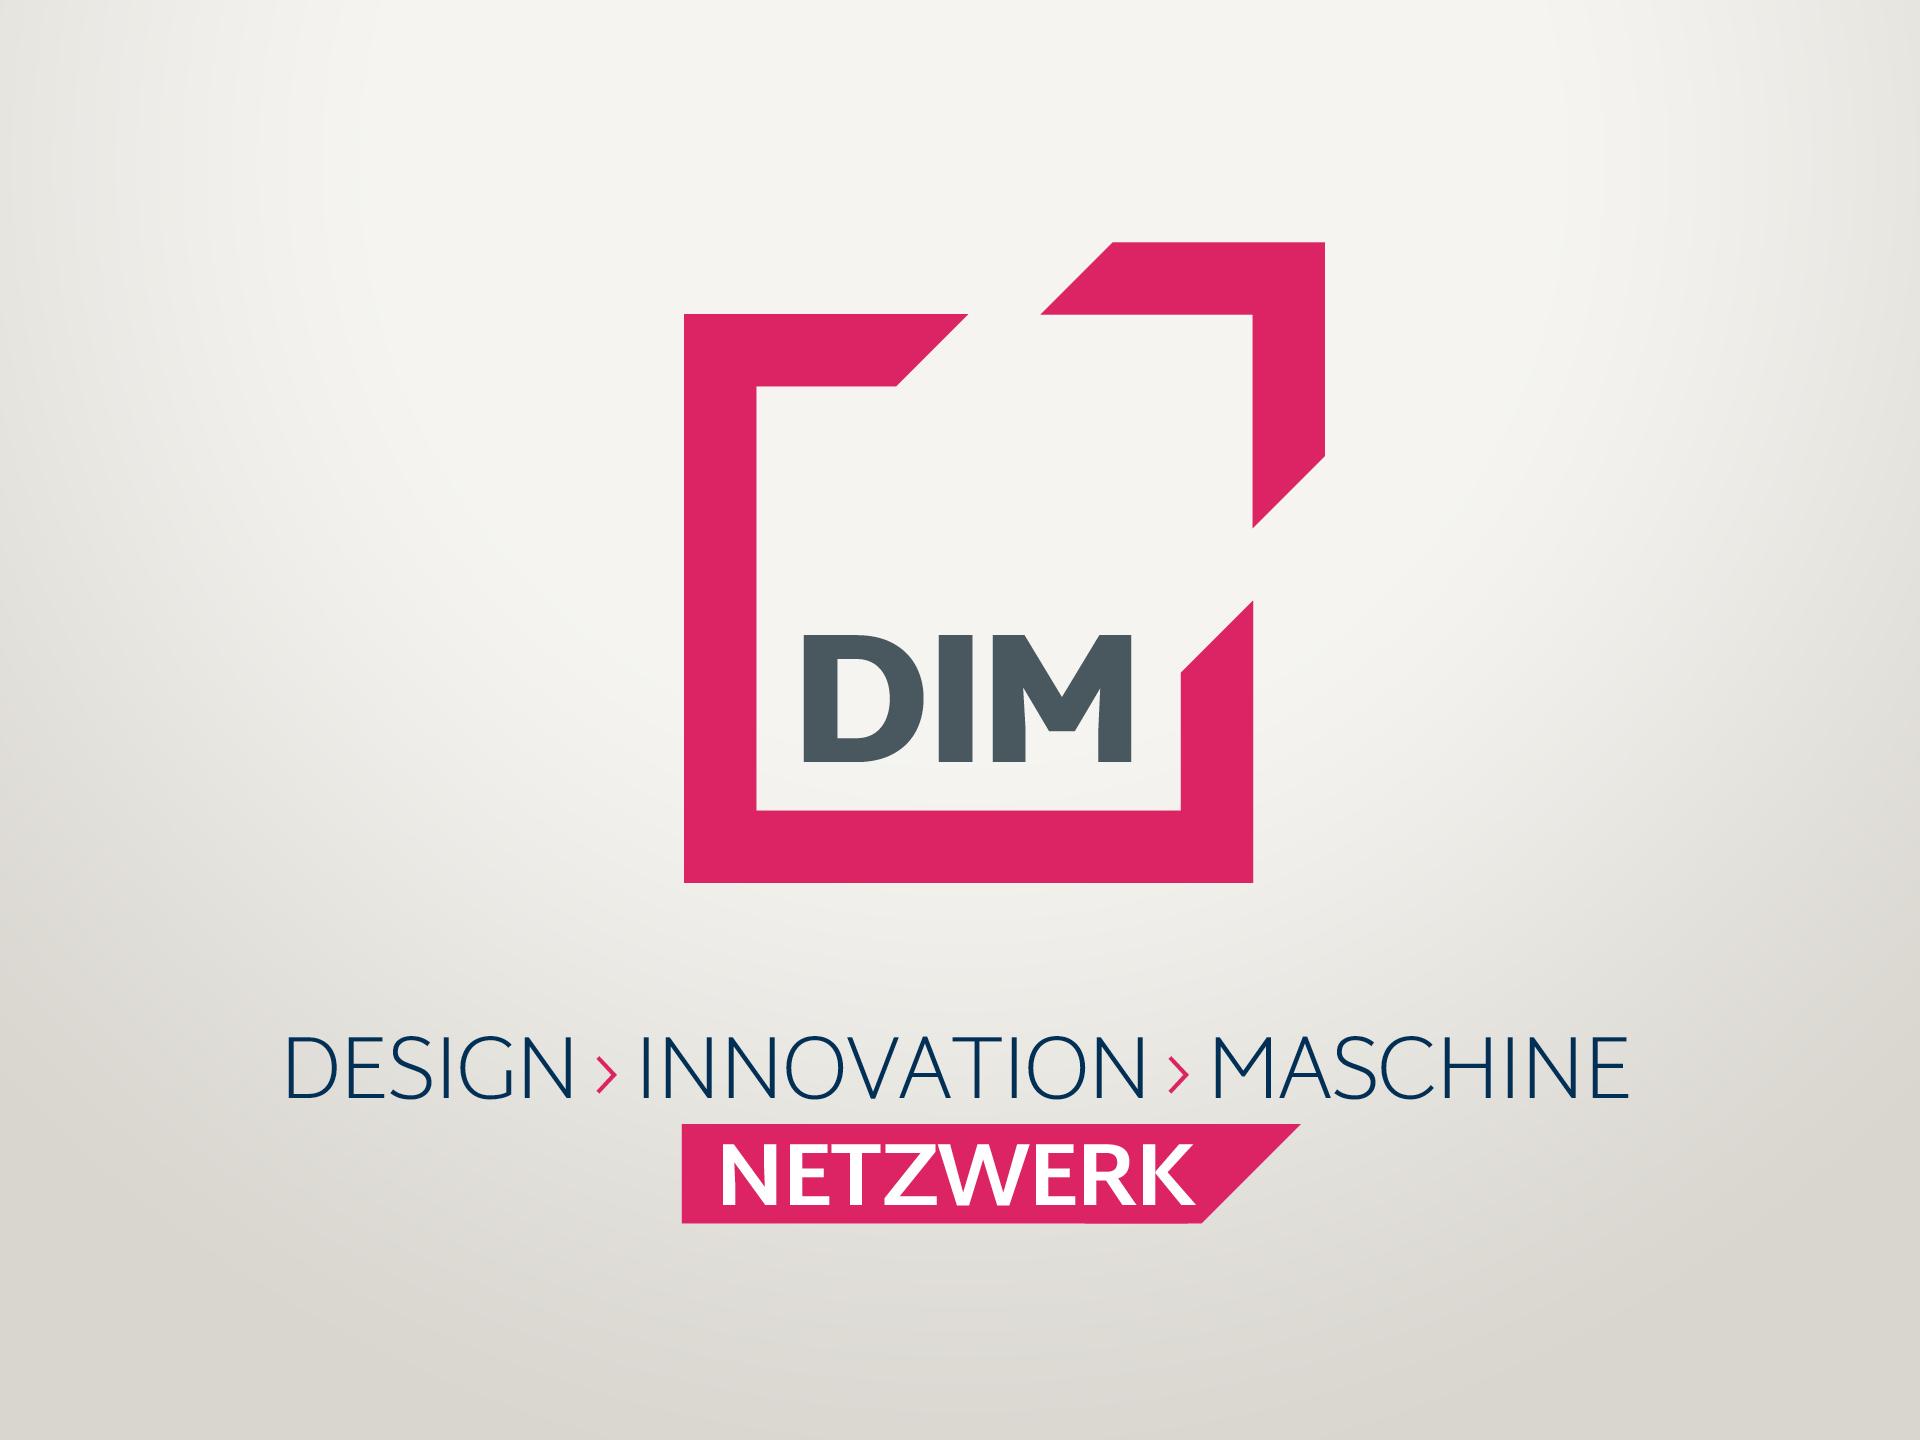 Agentur Corporate Design | Dim Netzwerk Corporate Design Agentur Frische Ideen